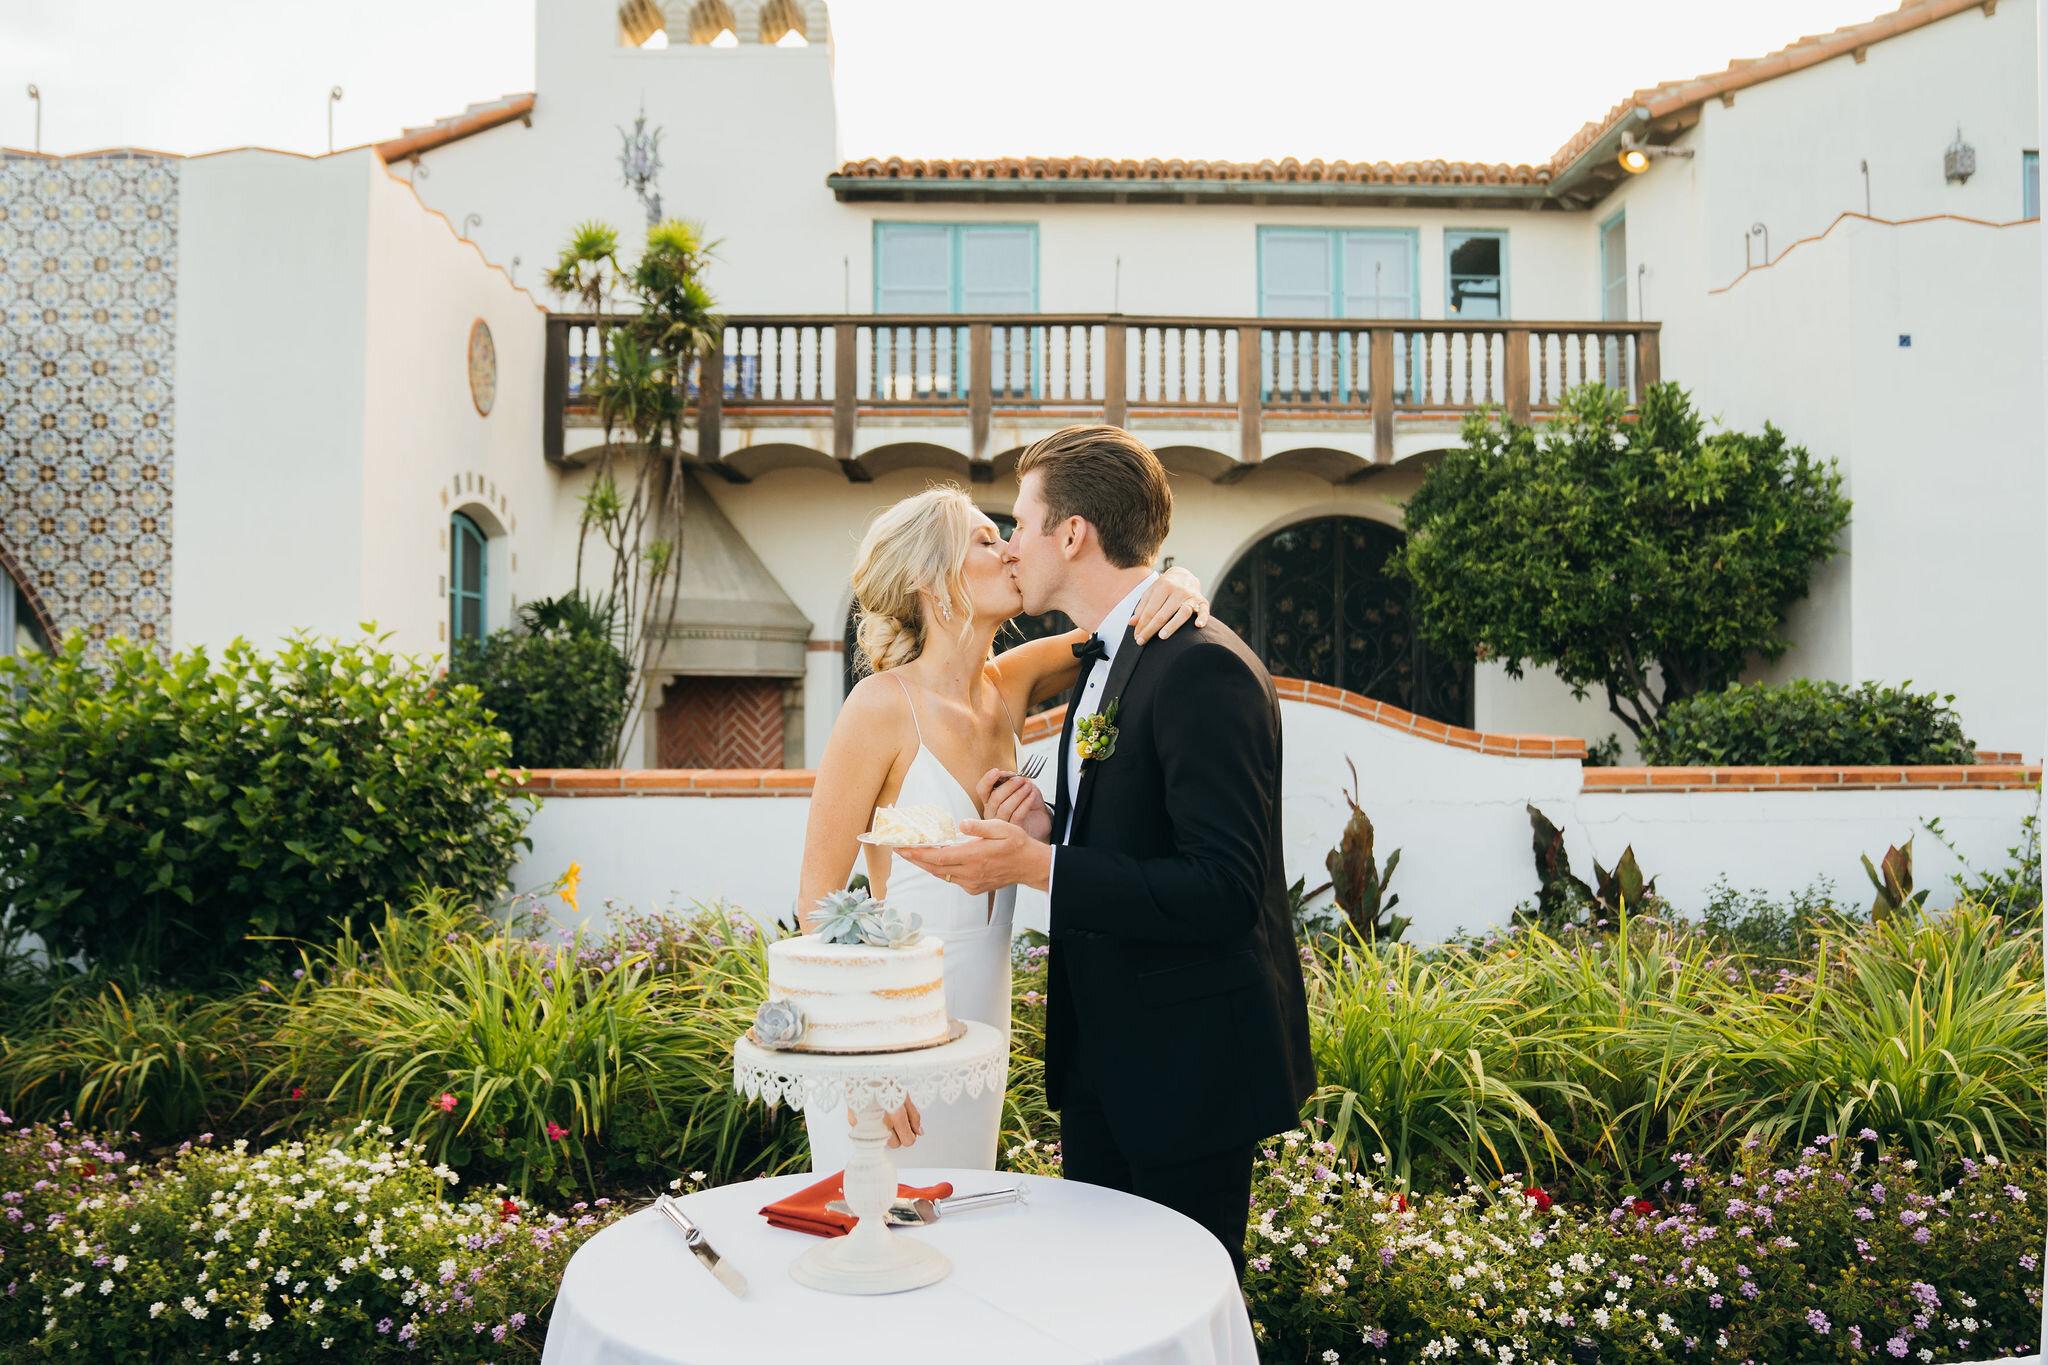 adamson-house-wedding-photography-168.jpg